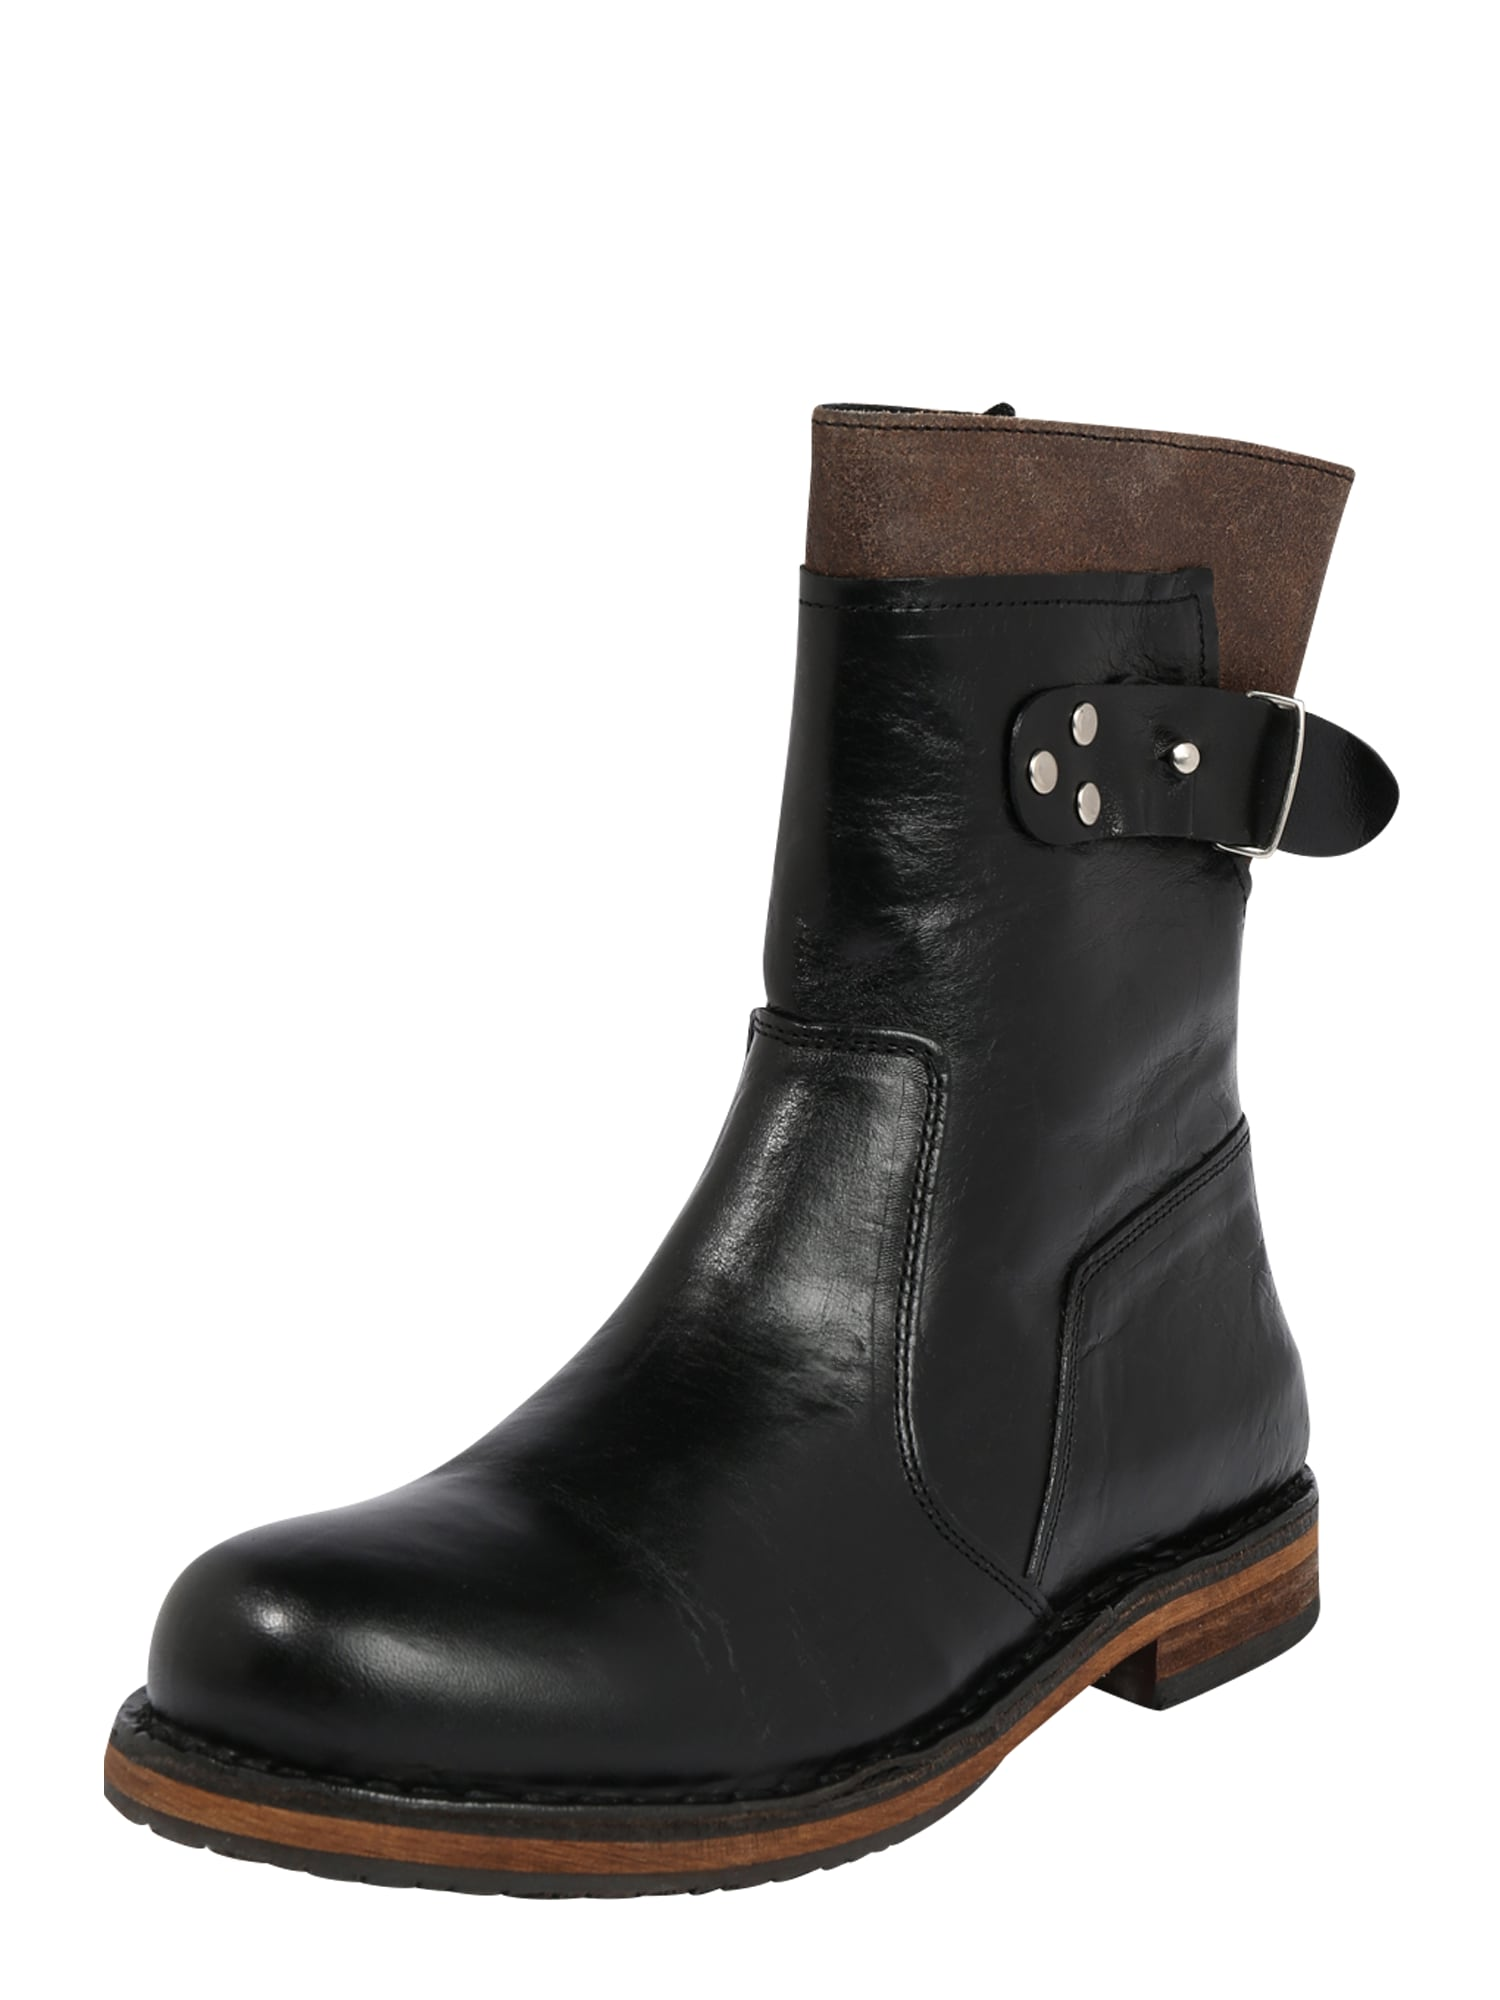 Ca Shott Auliniai batai ruda / juoda